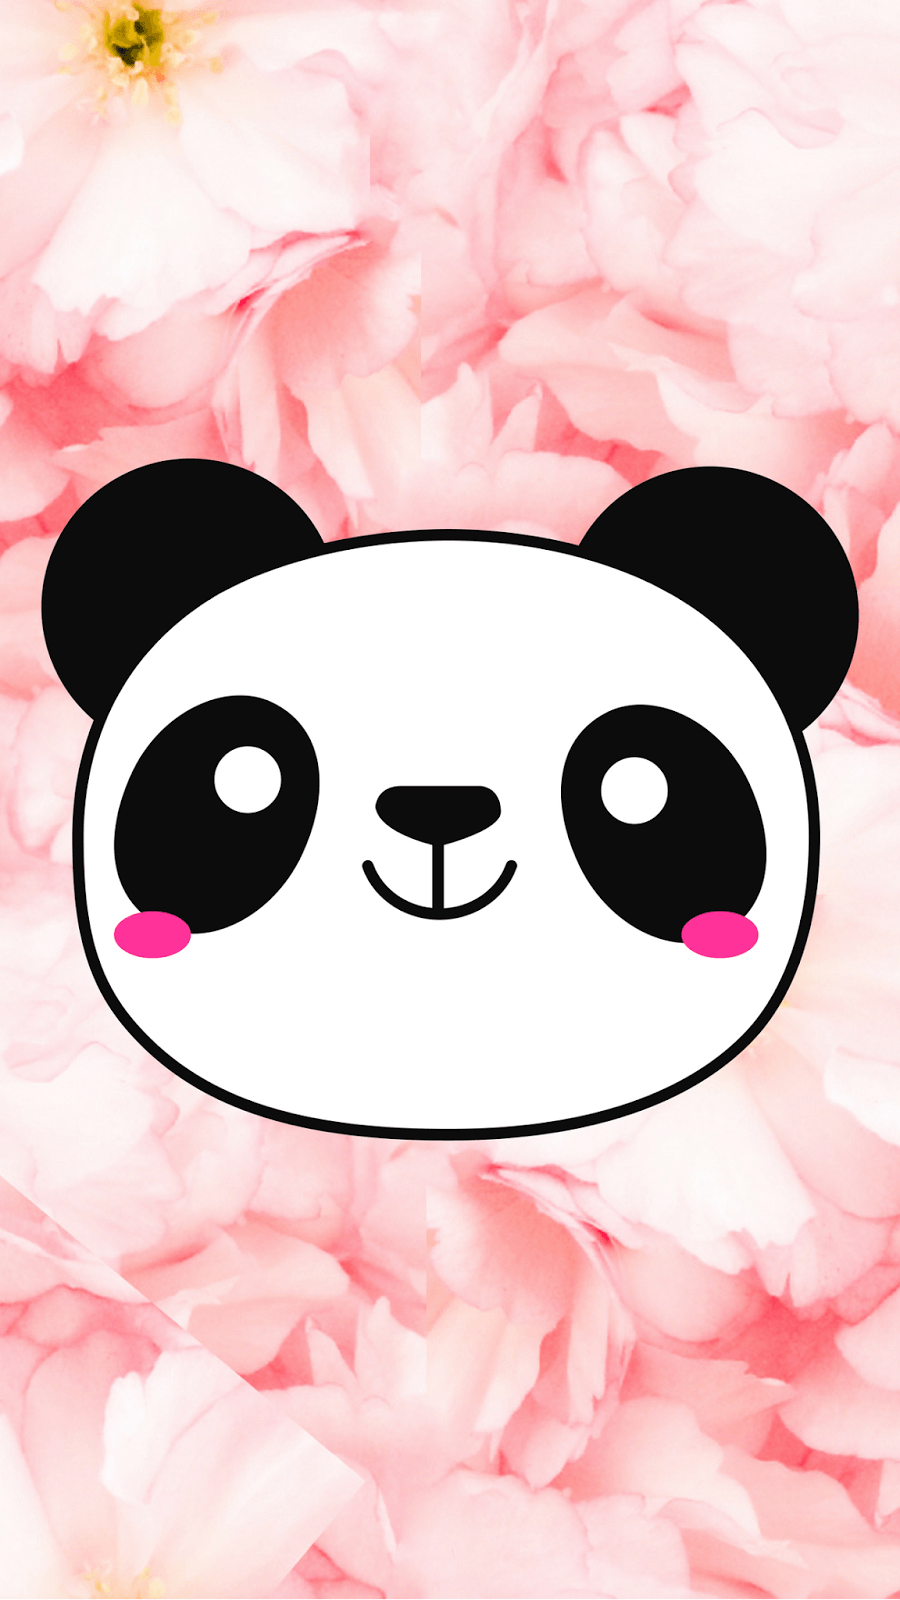 Cool Panda Wallpapers Top Free Cool Panda Backgrounds